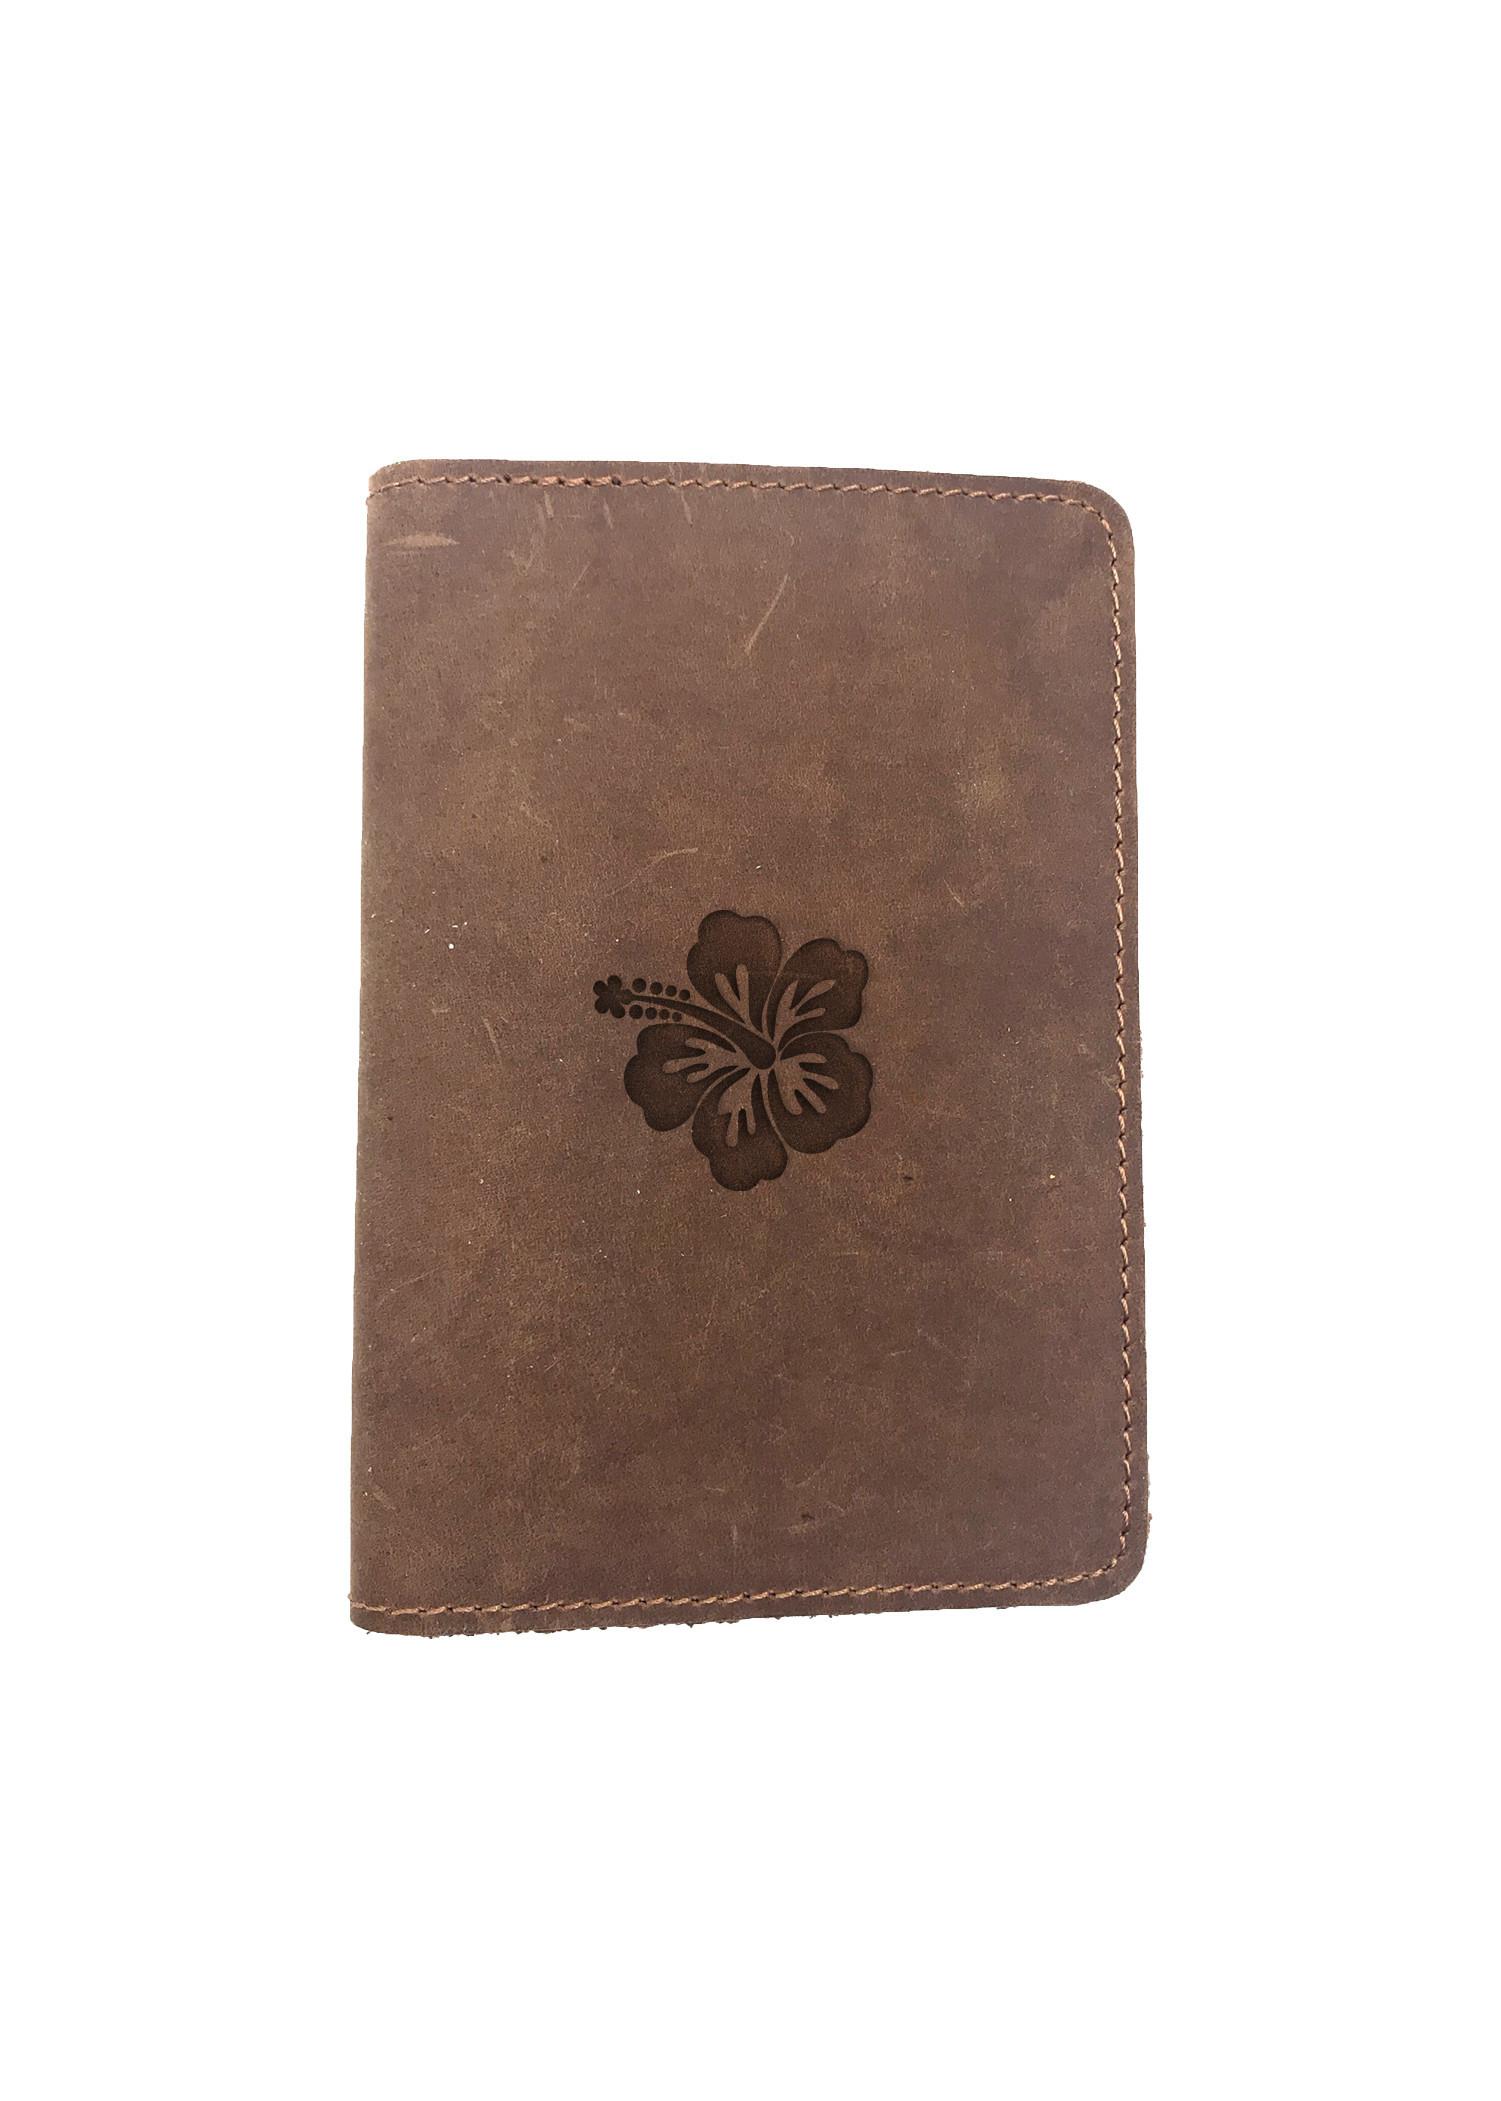 Passport Cover Bao Da Hộ Chiếu Da Sáp Khắc Hình Hoa dâm bụt HIBISCUS FLOWER (BROWN)